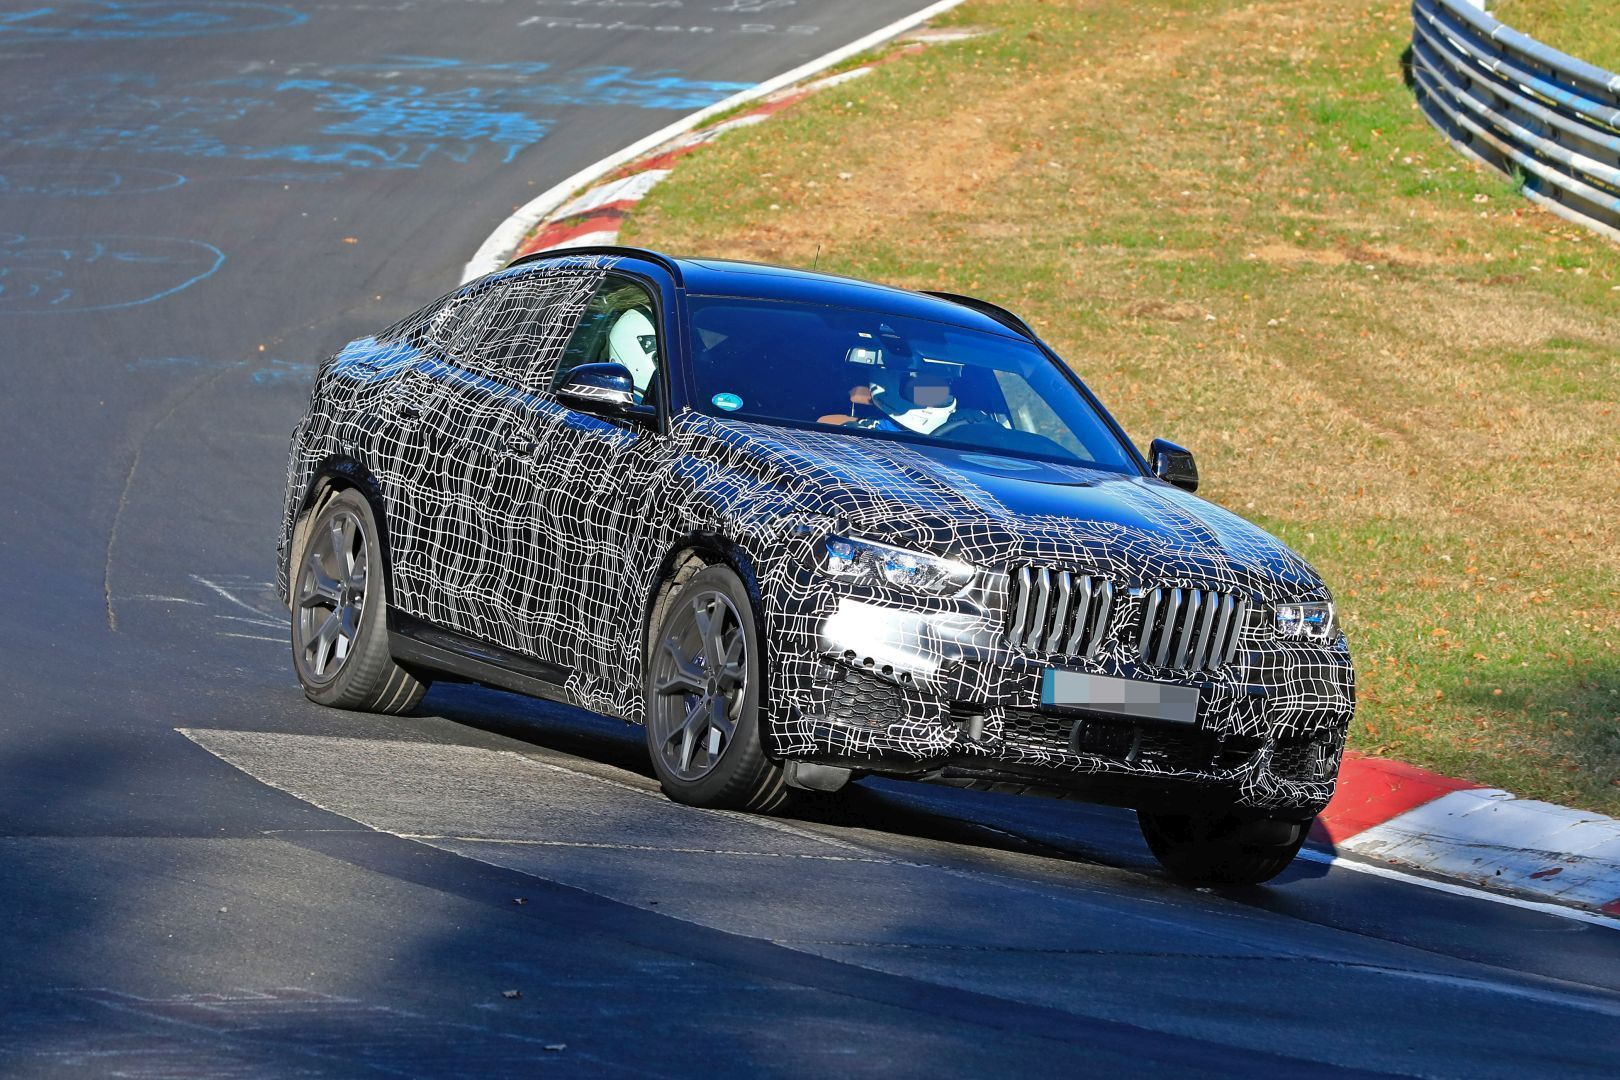 2020-bmw-x6-laps-nurburgring-prototype-reveals-sharper-look_4